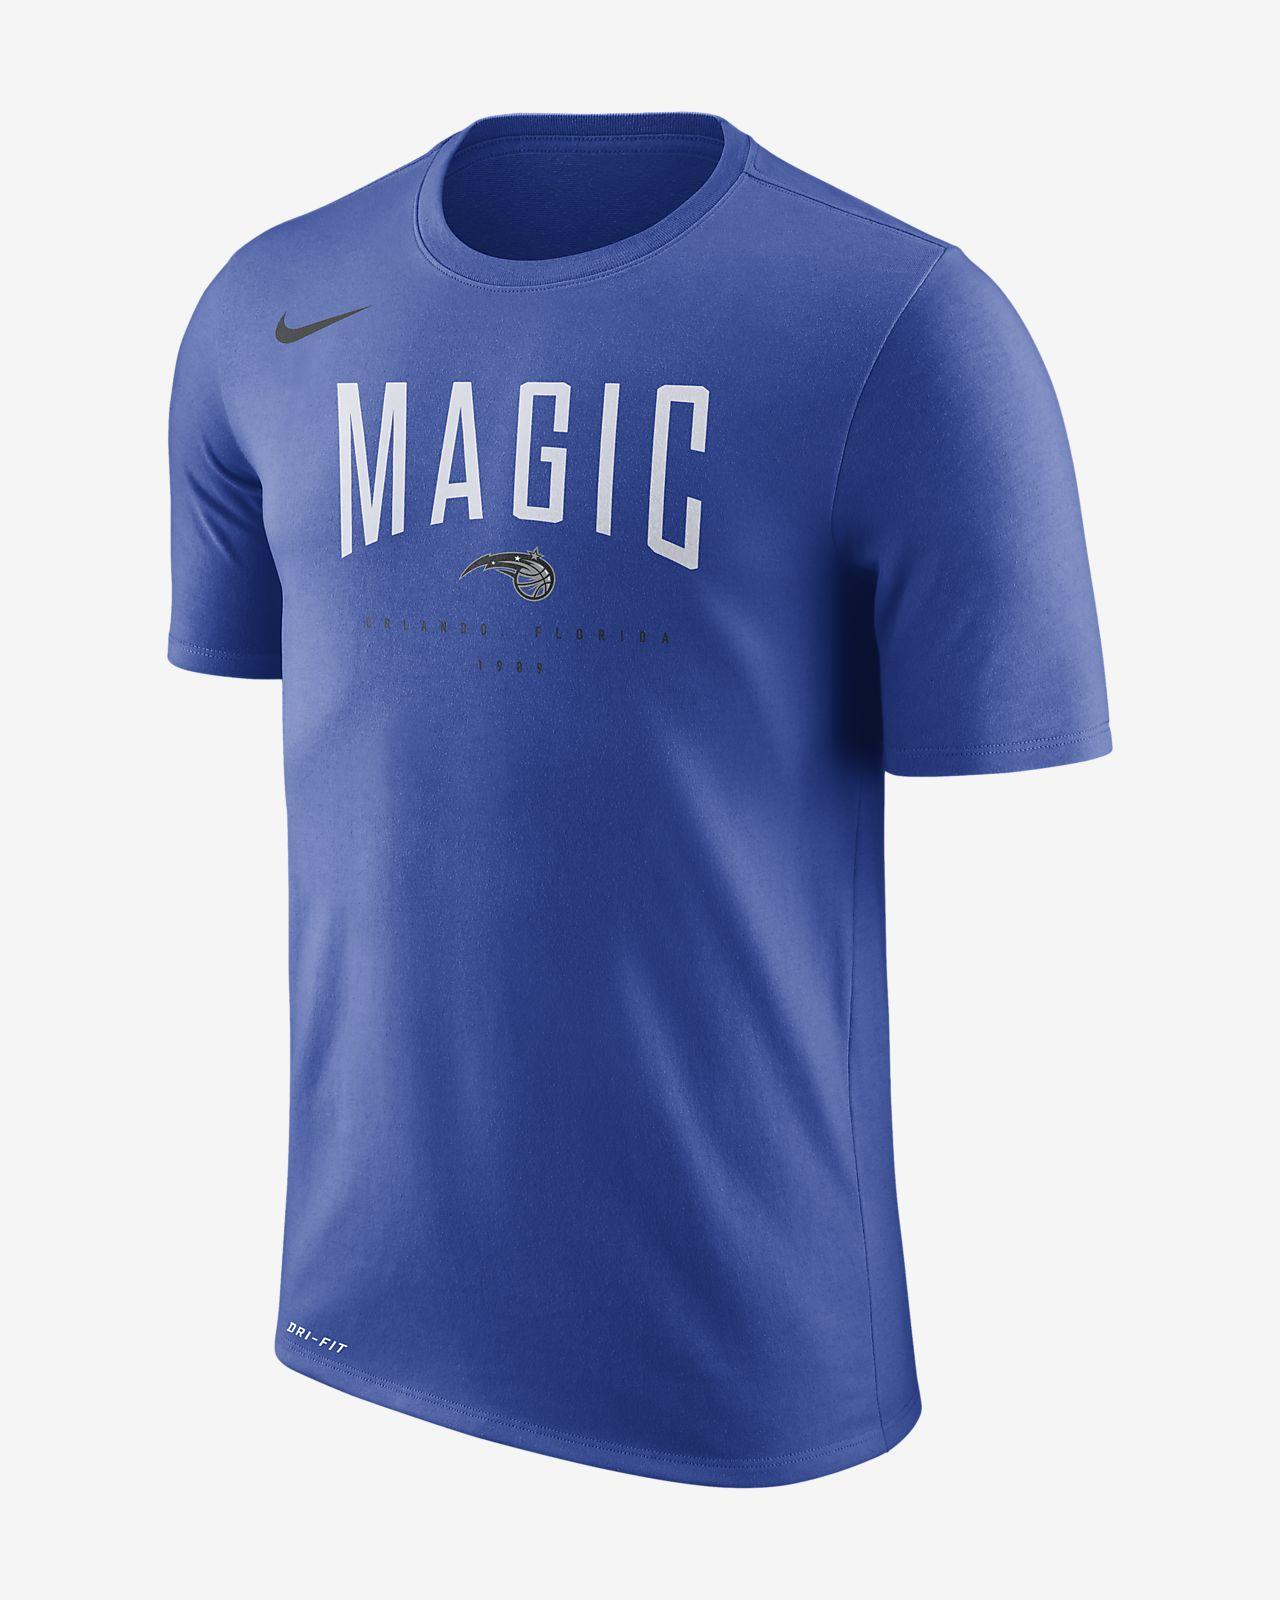 Orlando Magic Nike Dri-FIT Men's NBA T-Shirt